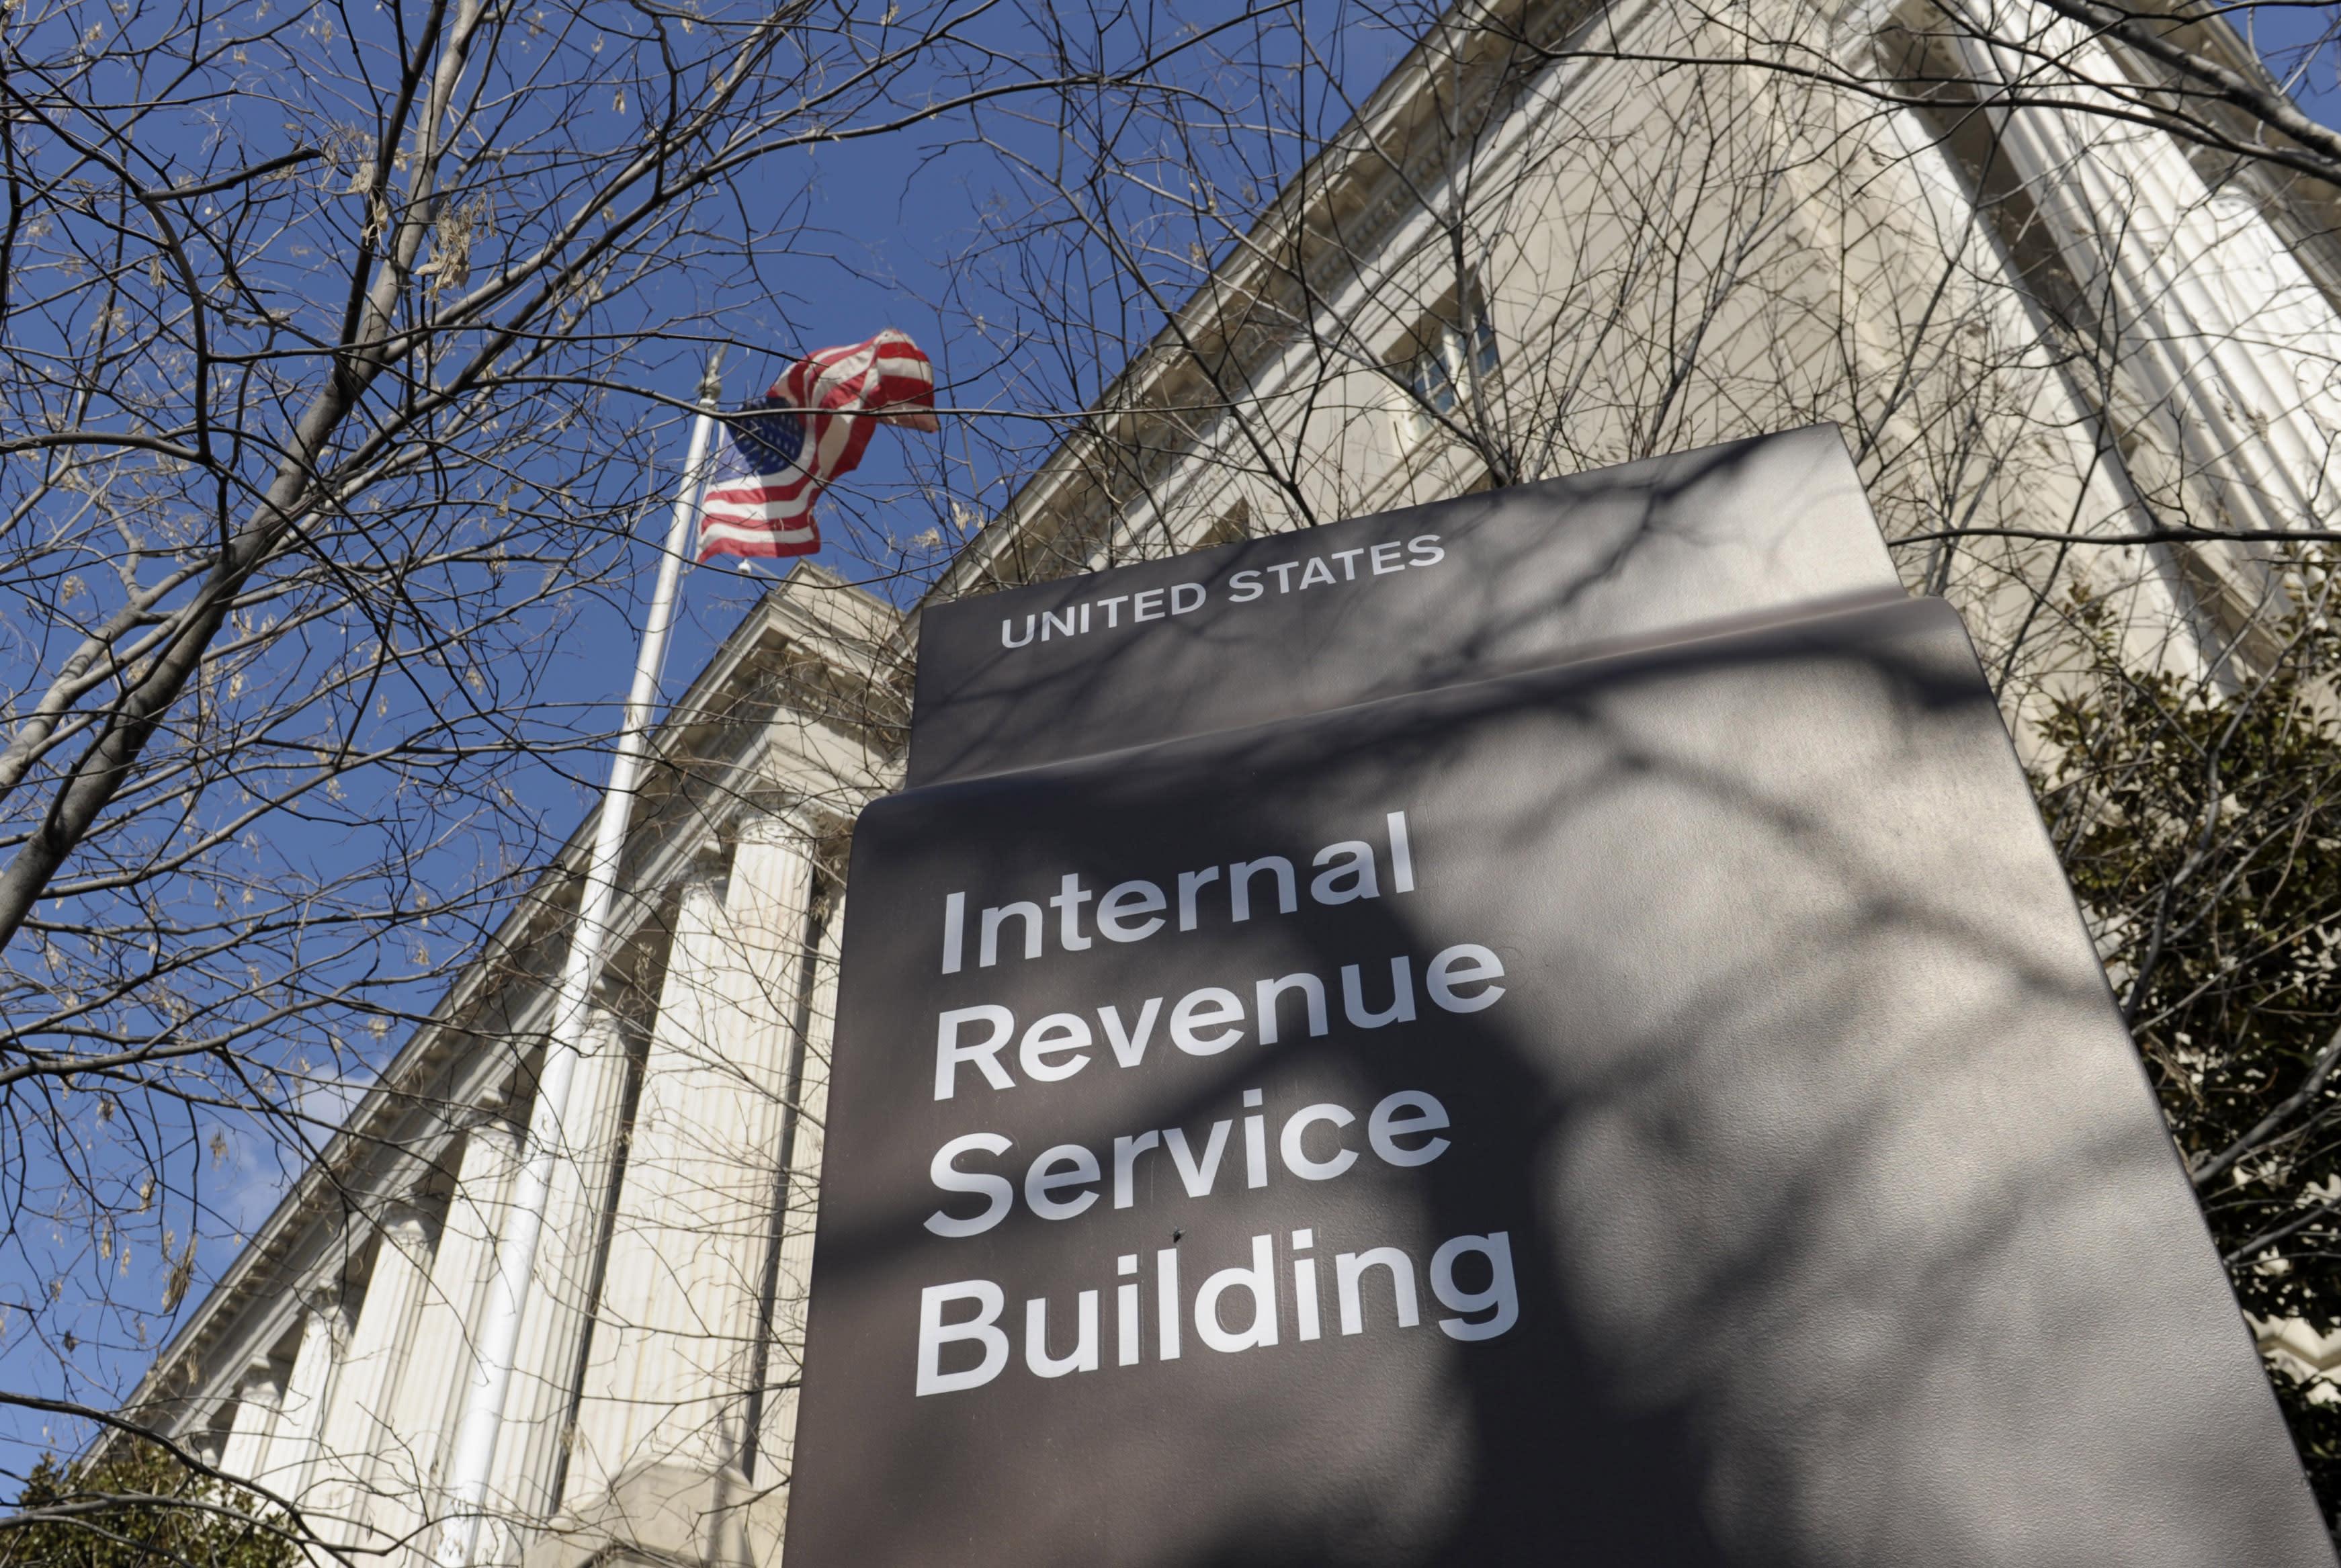 IRS draws new criticism over $70M employee bonuses